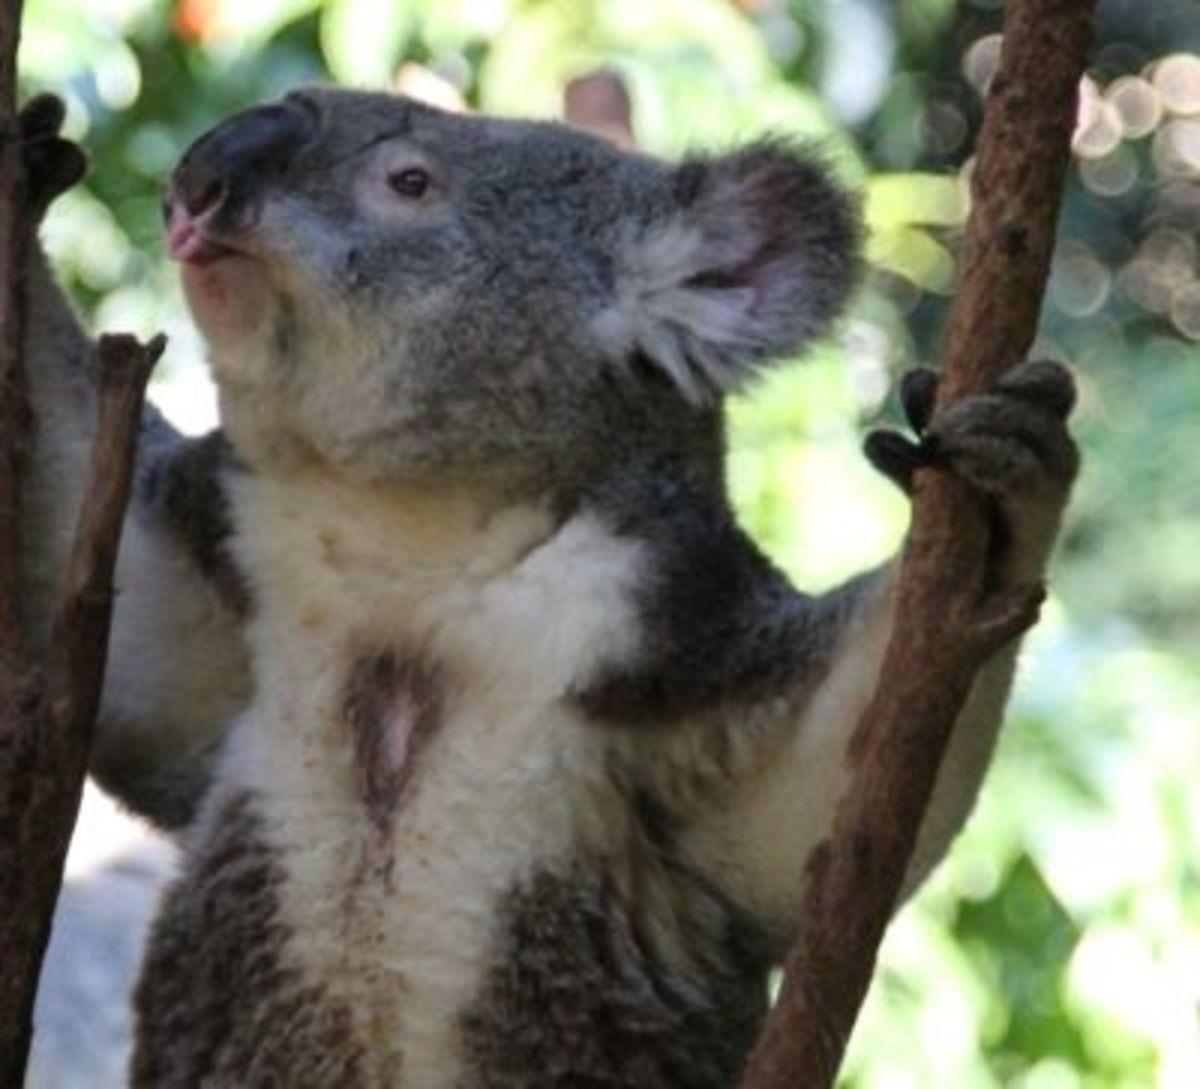 Male Koala's scent gland